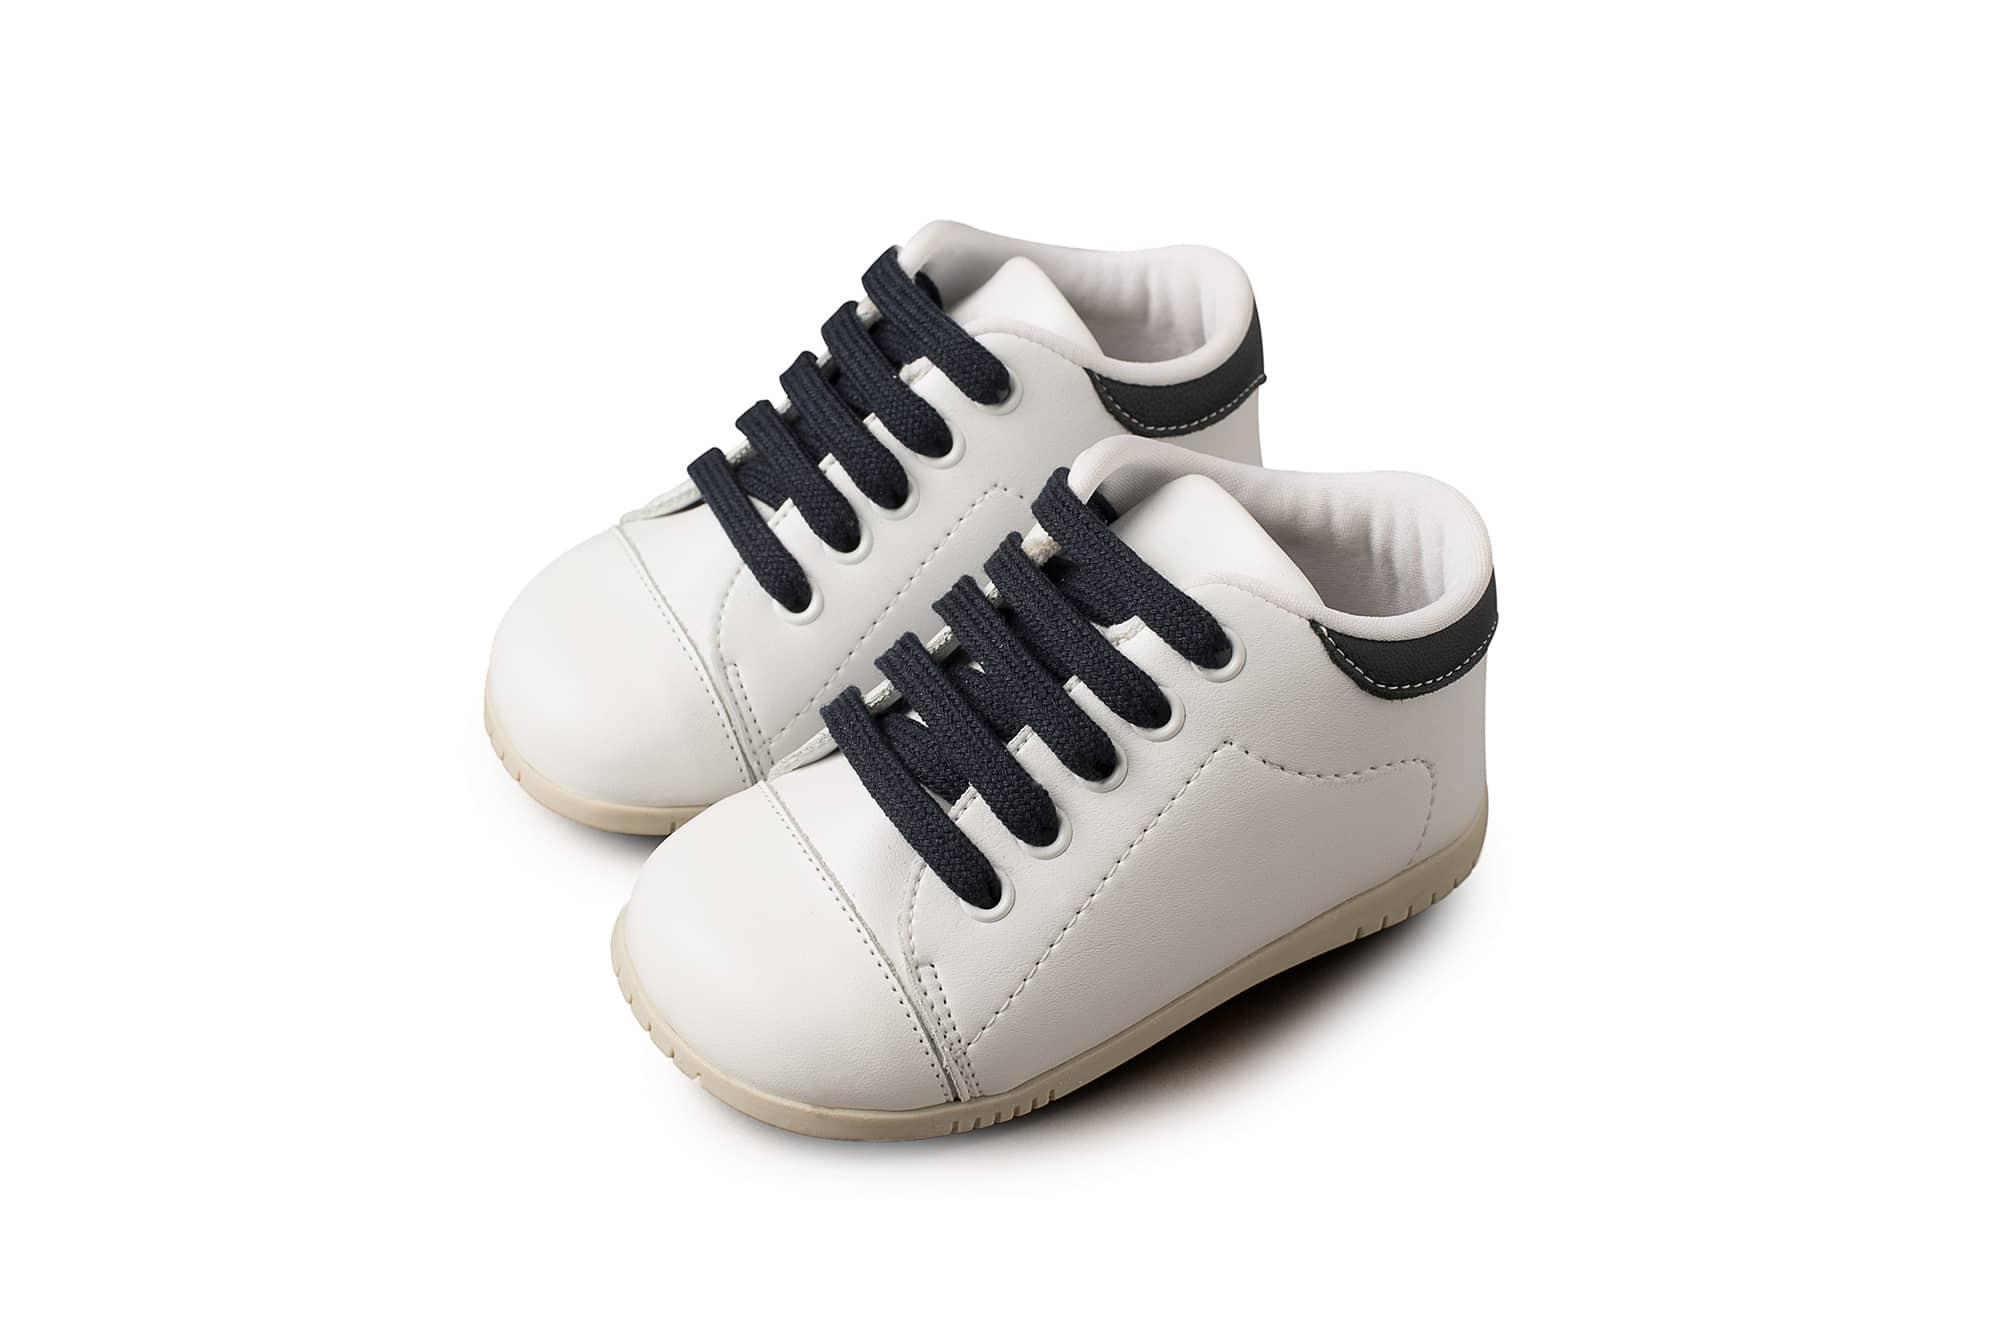 751d390c243 Βαπτιστικά Παπούτσια για Αγόρι Babywalker Δετό Sneaker (BS3025)